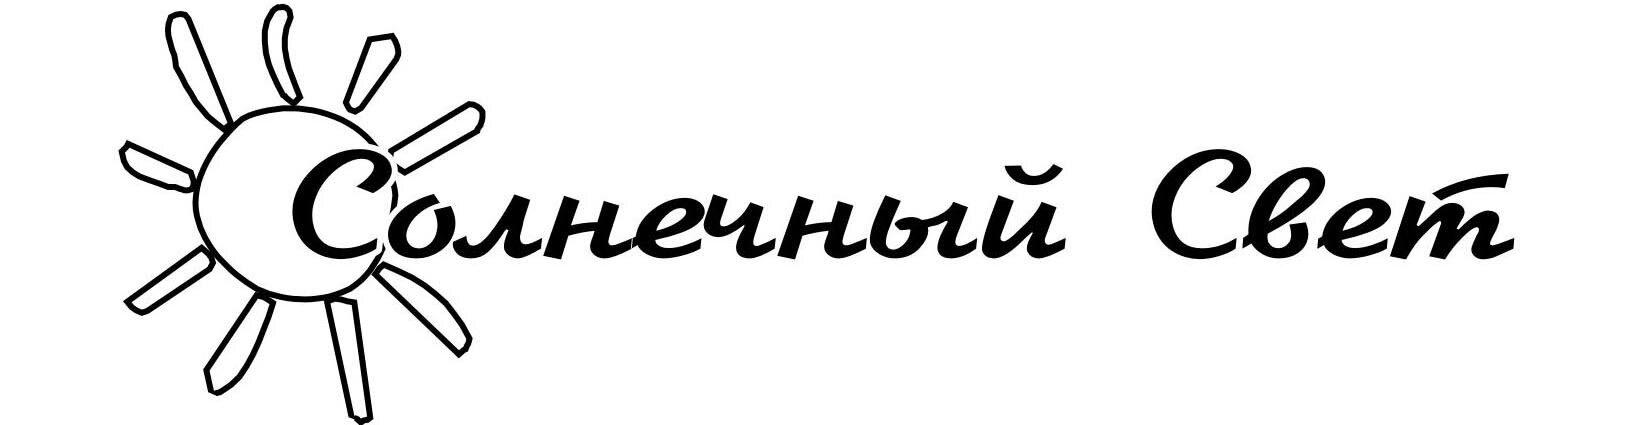 "Бальзам ""Кератин и Коллаген"" с маслом жожоба тм ""Солнечный Свет"" - фото pic_766b0cd7d6da374786e7be715e8ec9f7_1920x9000_1.jpg"